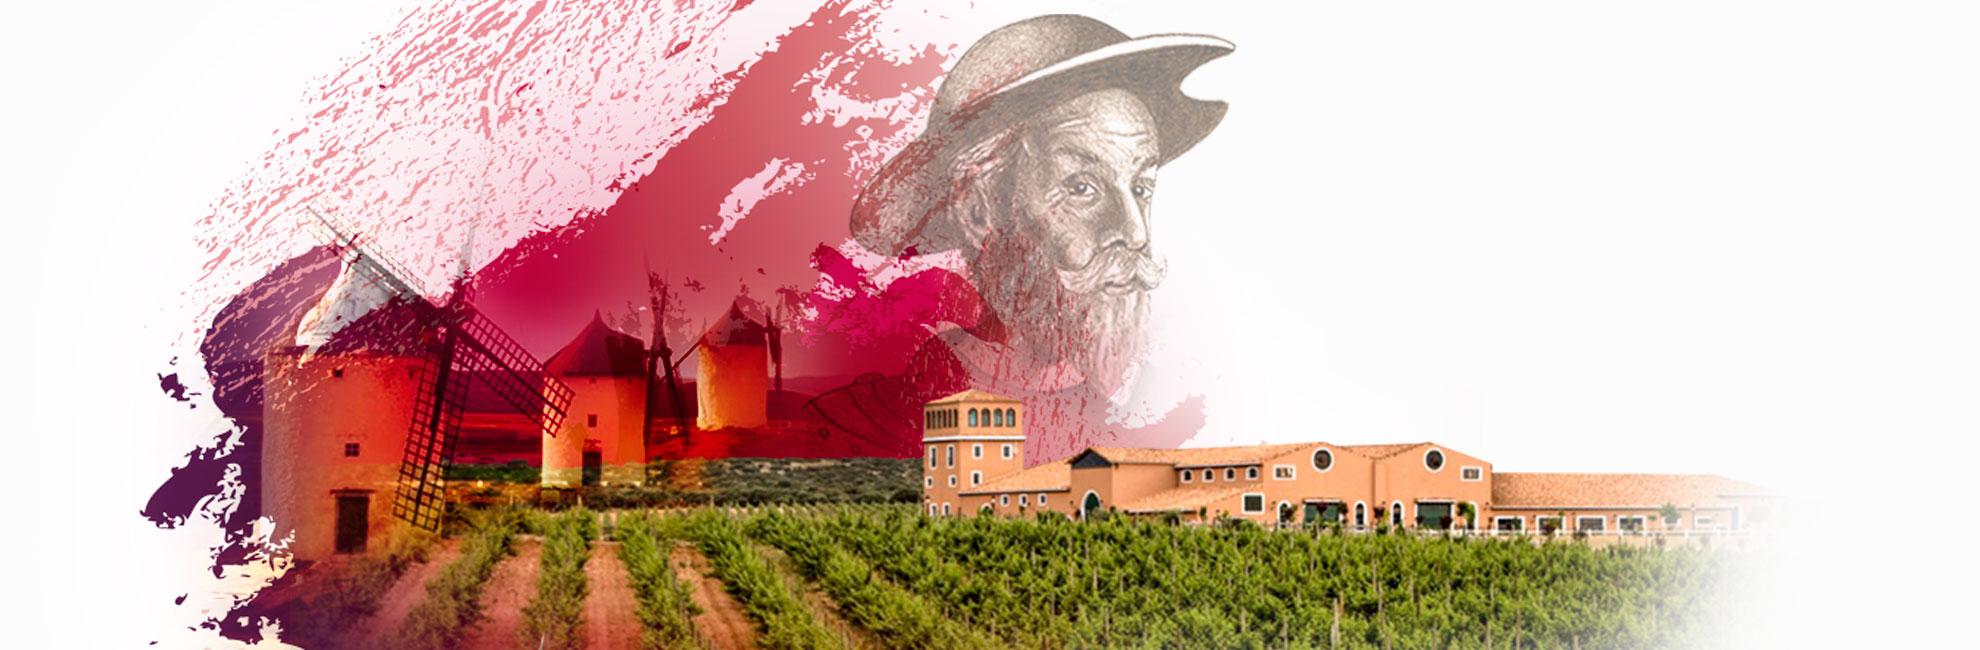 Castilla La Mancha Vinos Don Quijote Wines